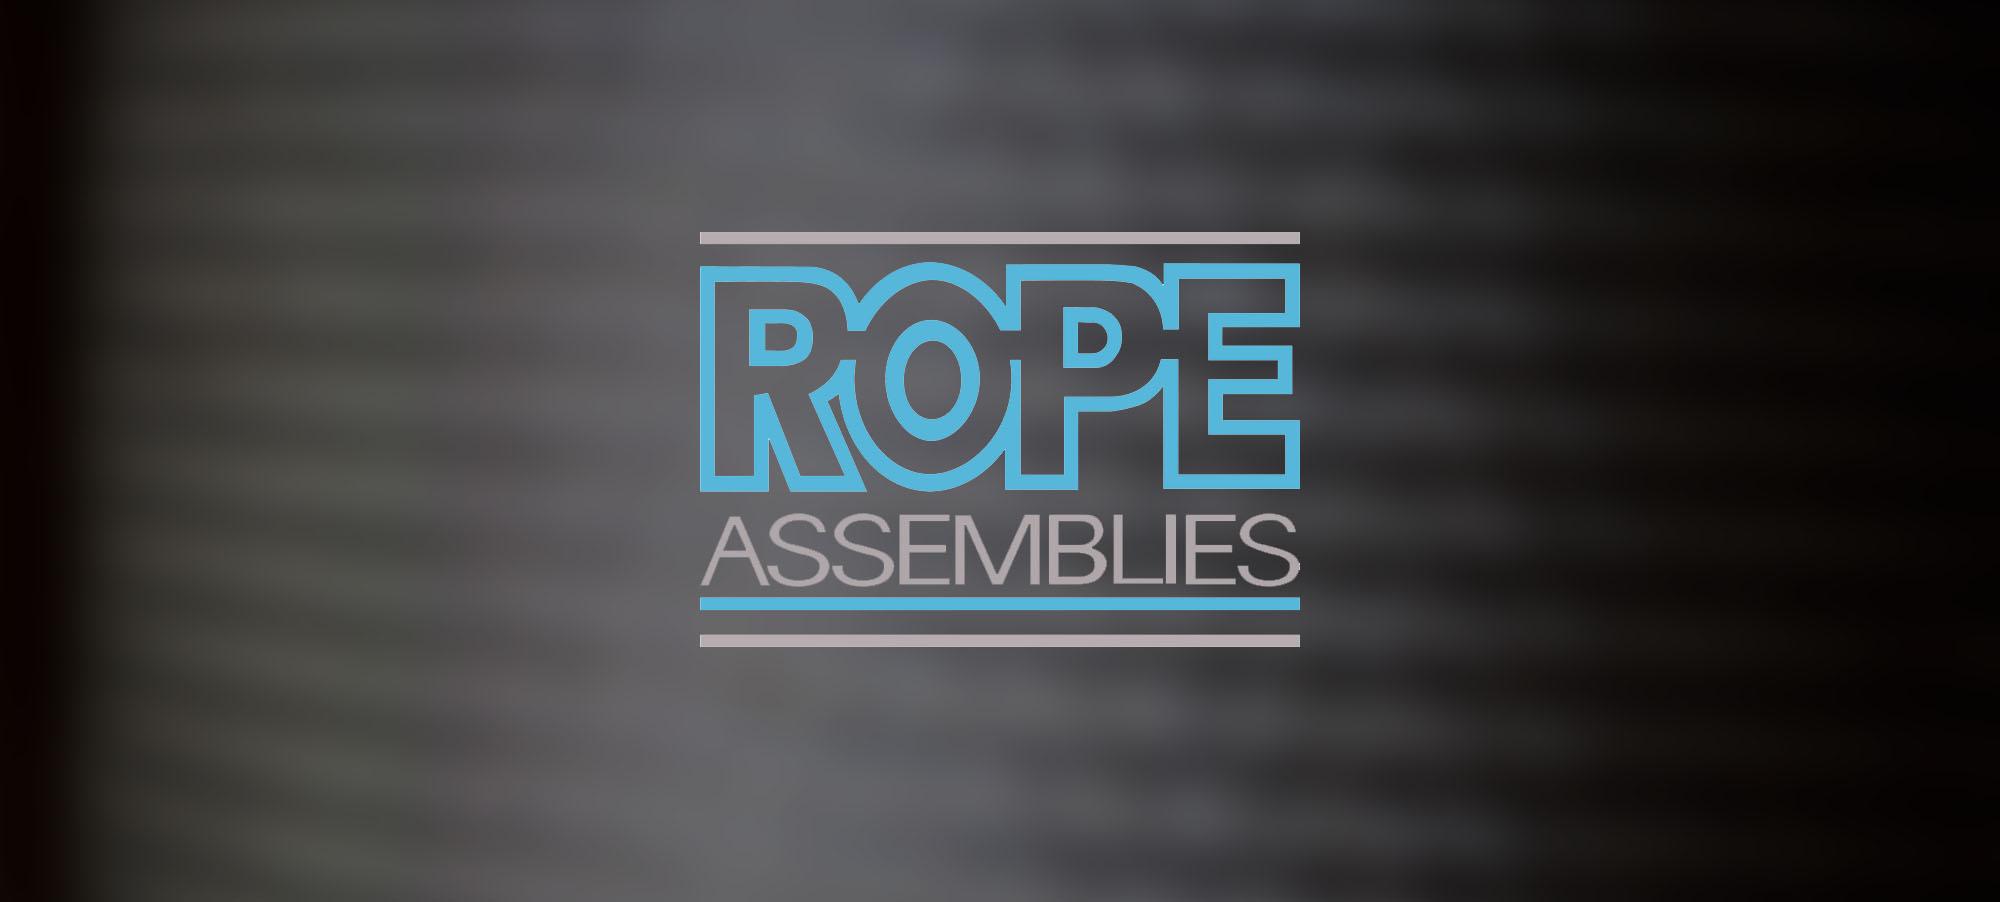 Rope Assemblies